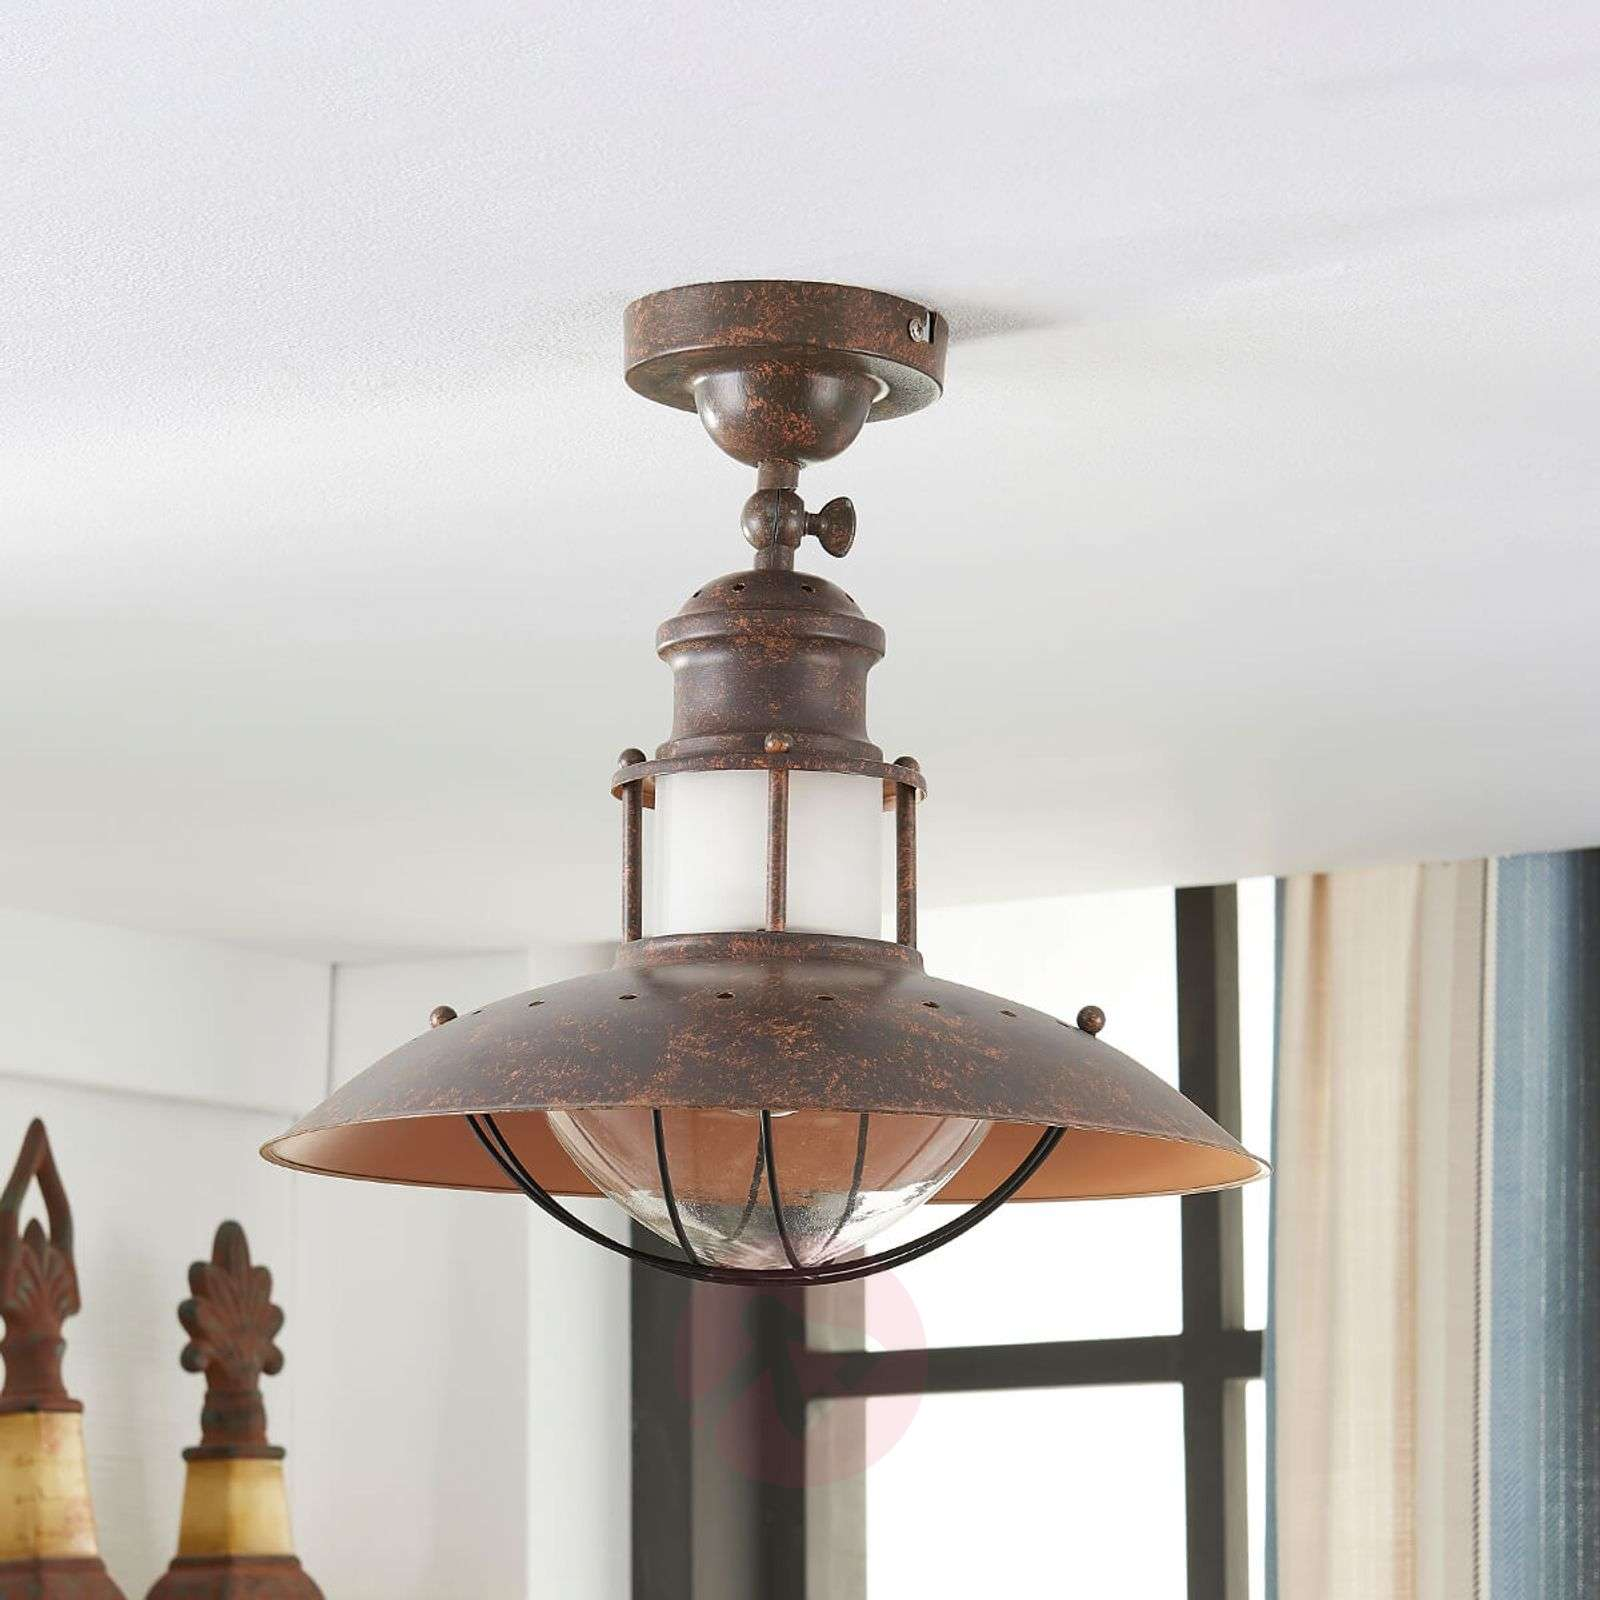 Rustic ceiling light Louisanne-9621170-02